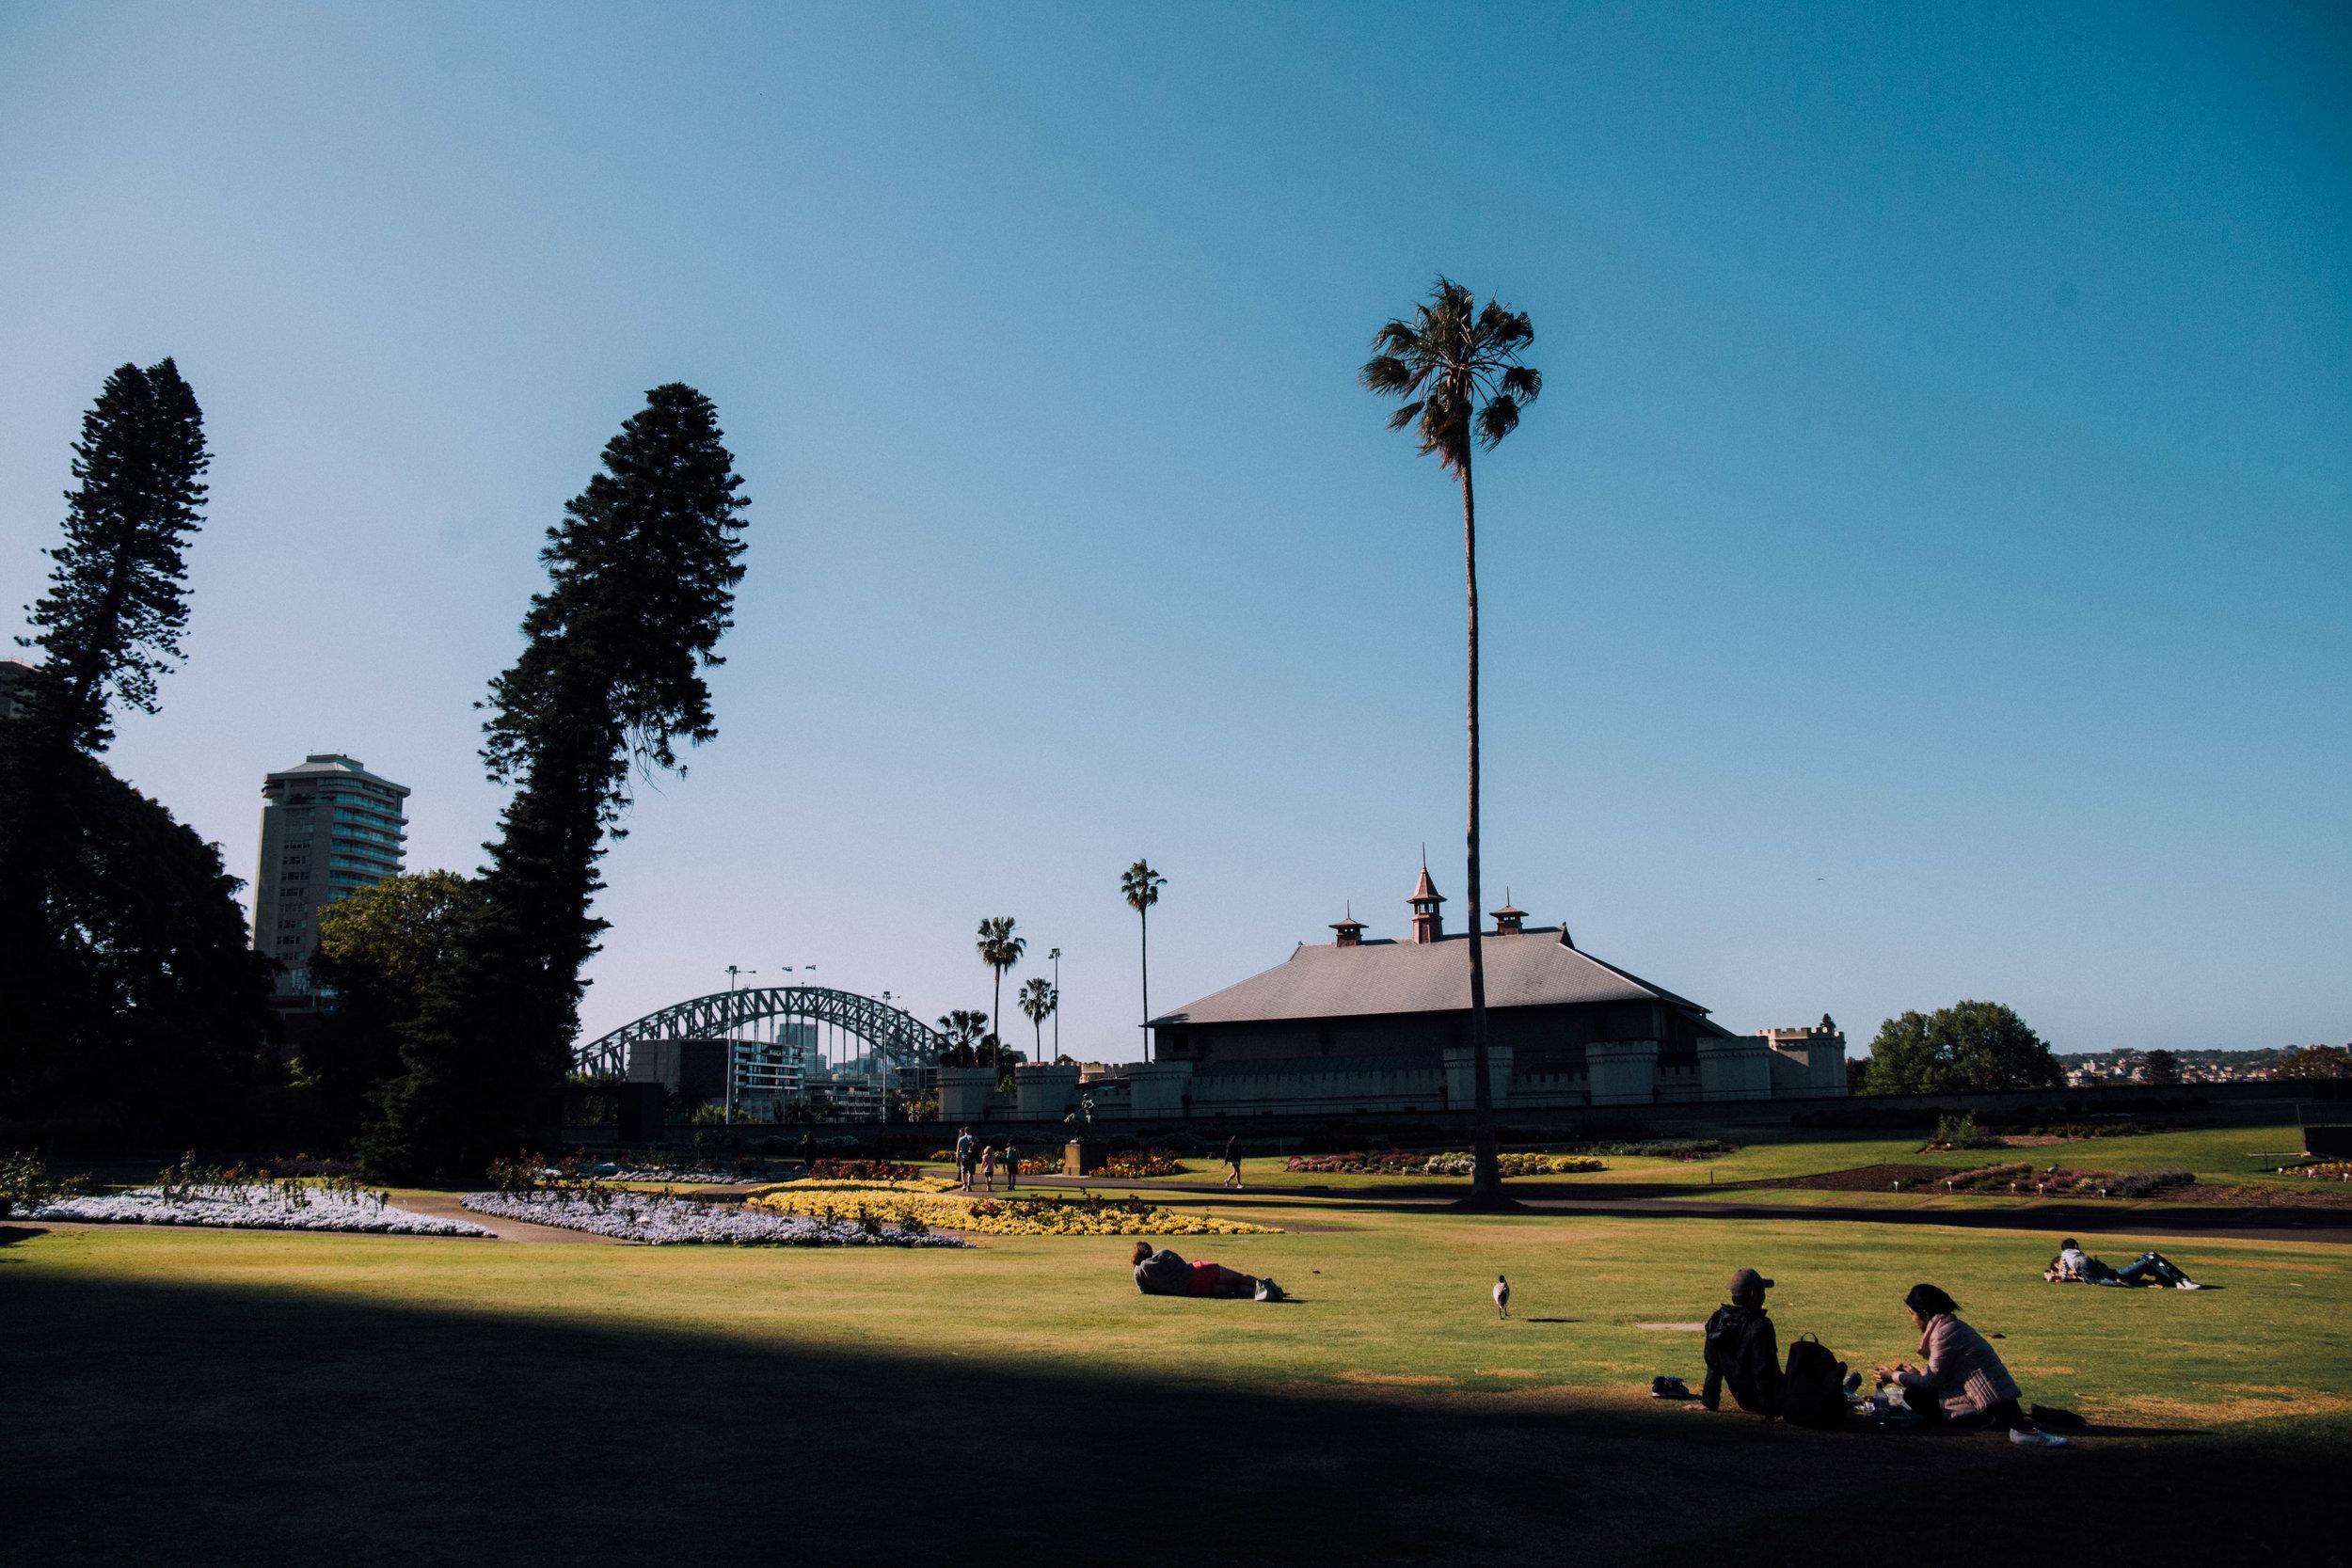 The Sydney Botanic Gardens - a nice place to run!